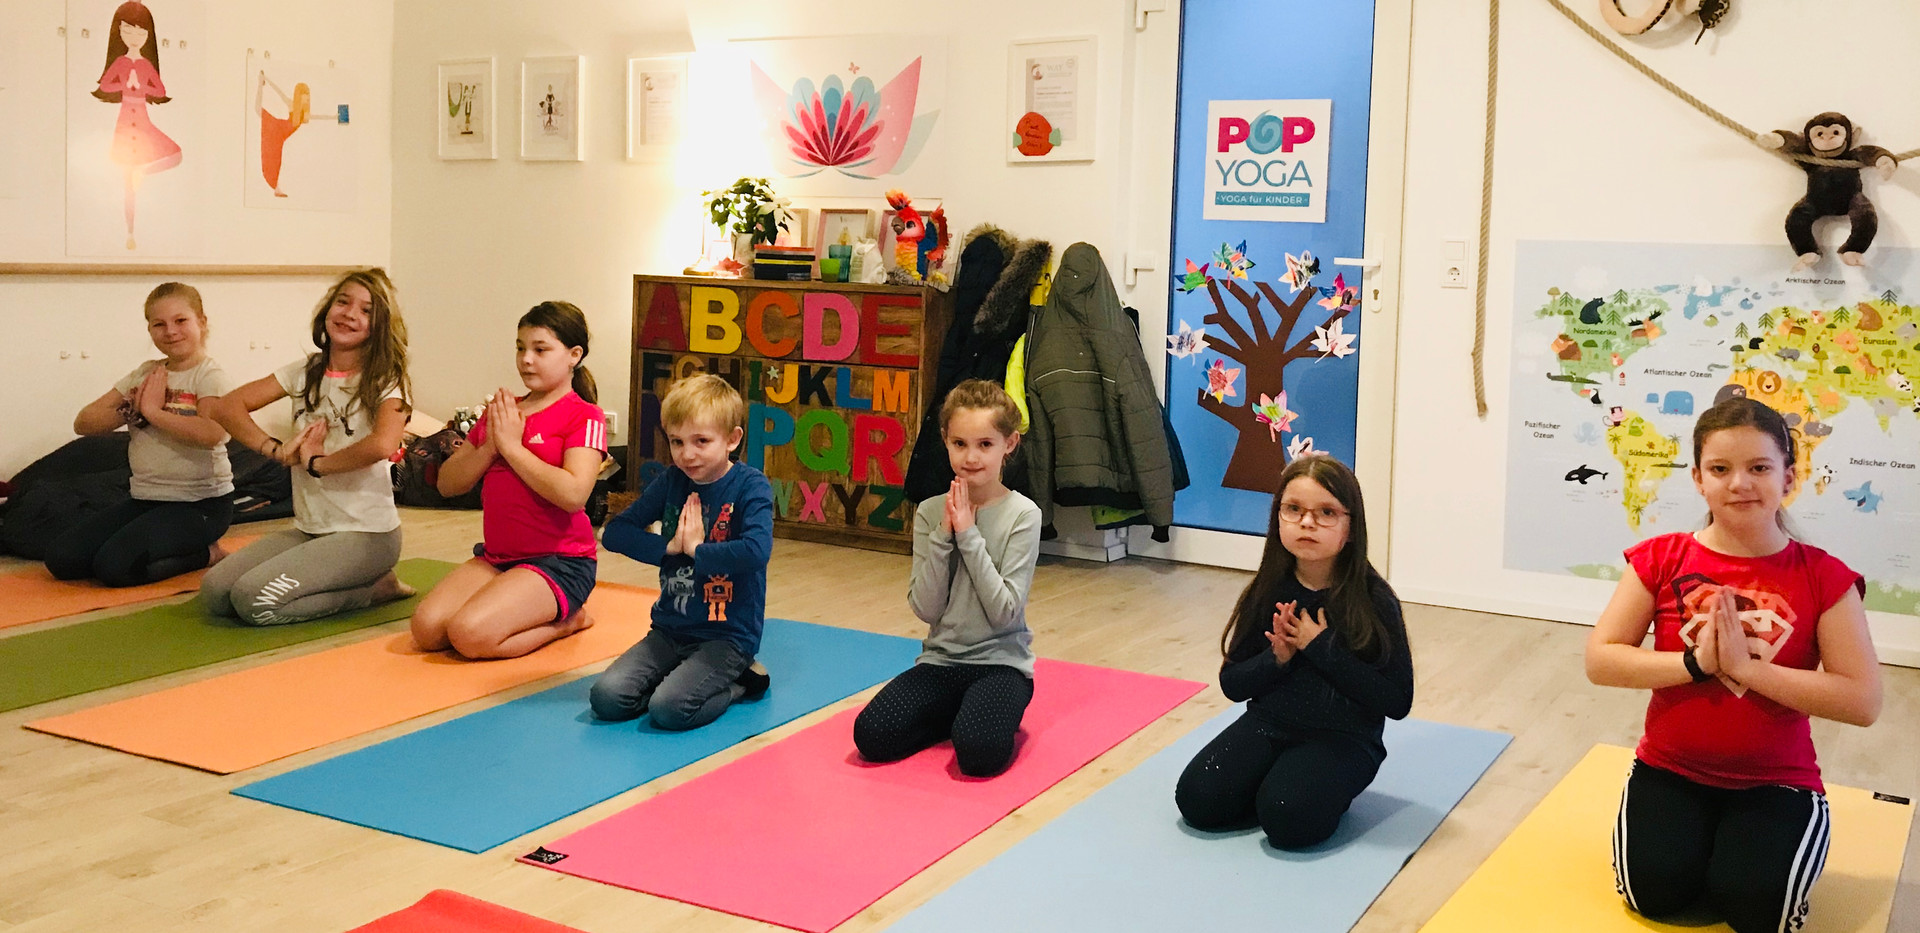 POP Tanz Yoga Party 9.jpg